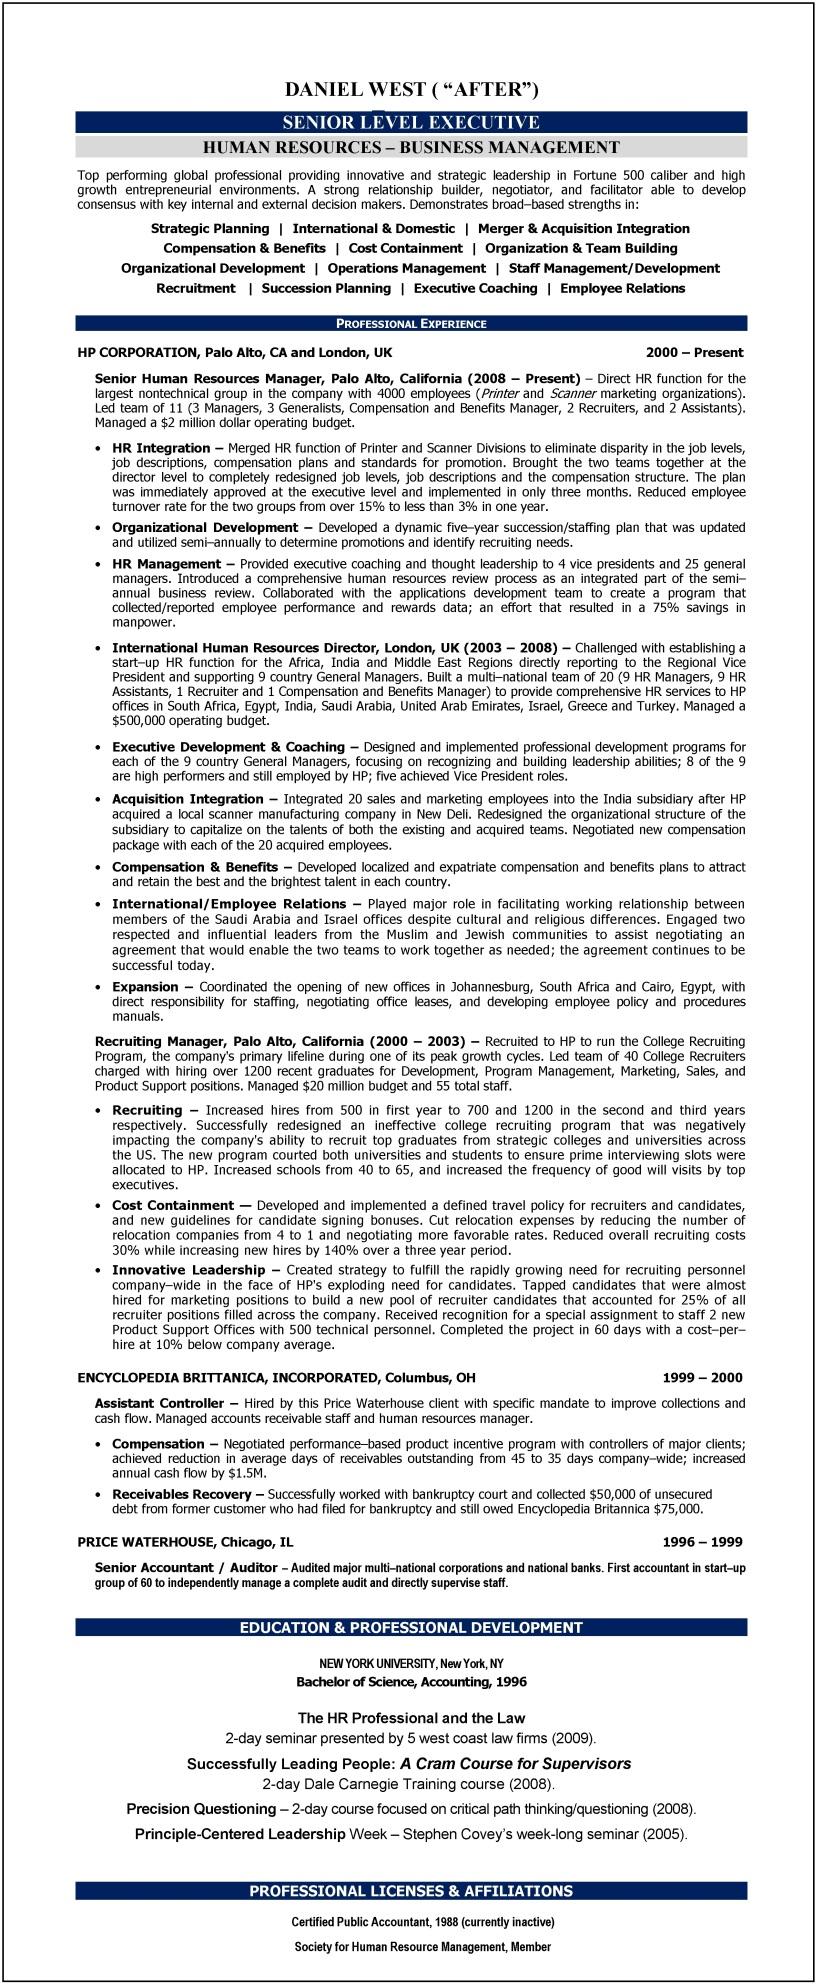 general resume tips - General Resume Tips